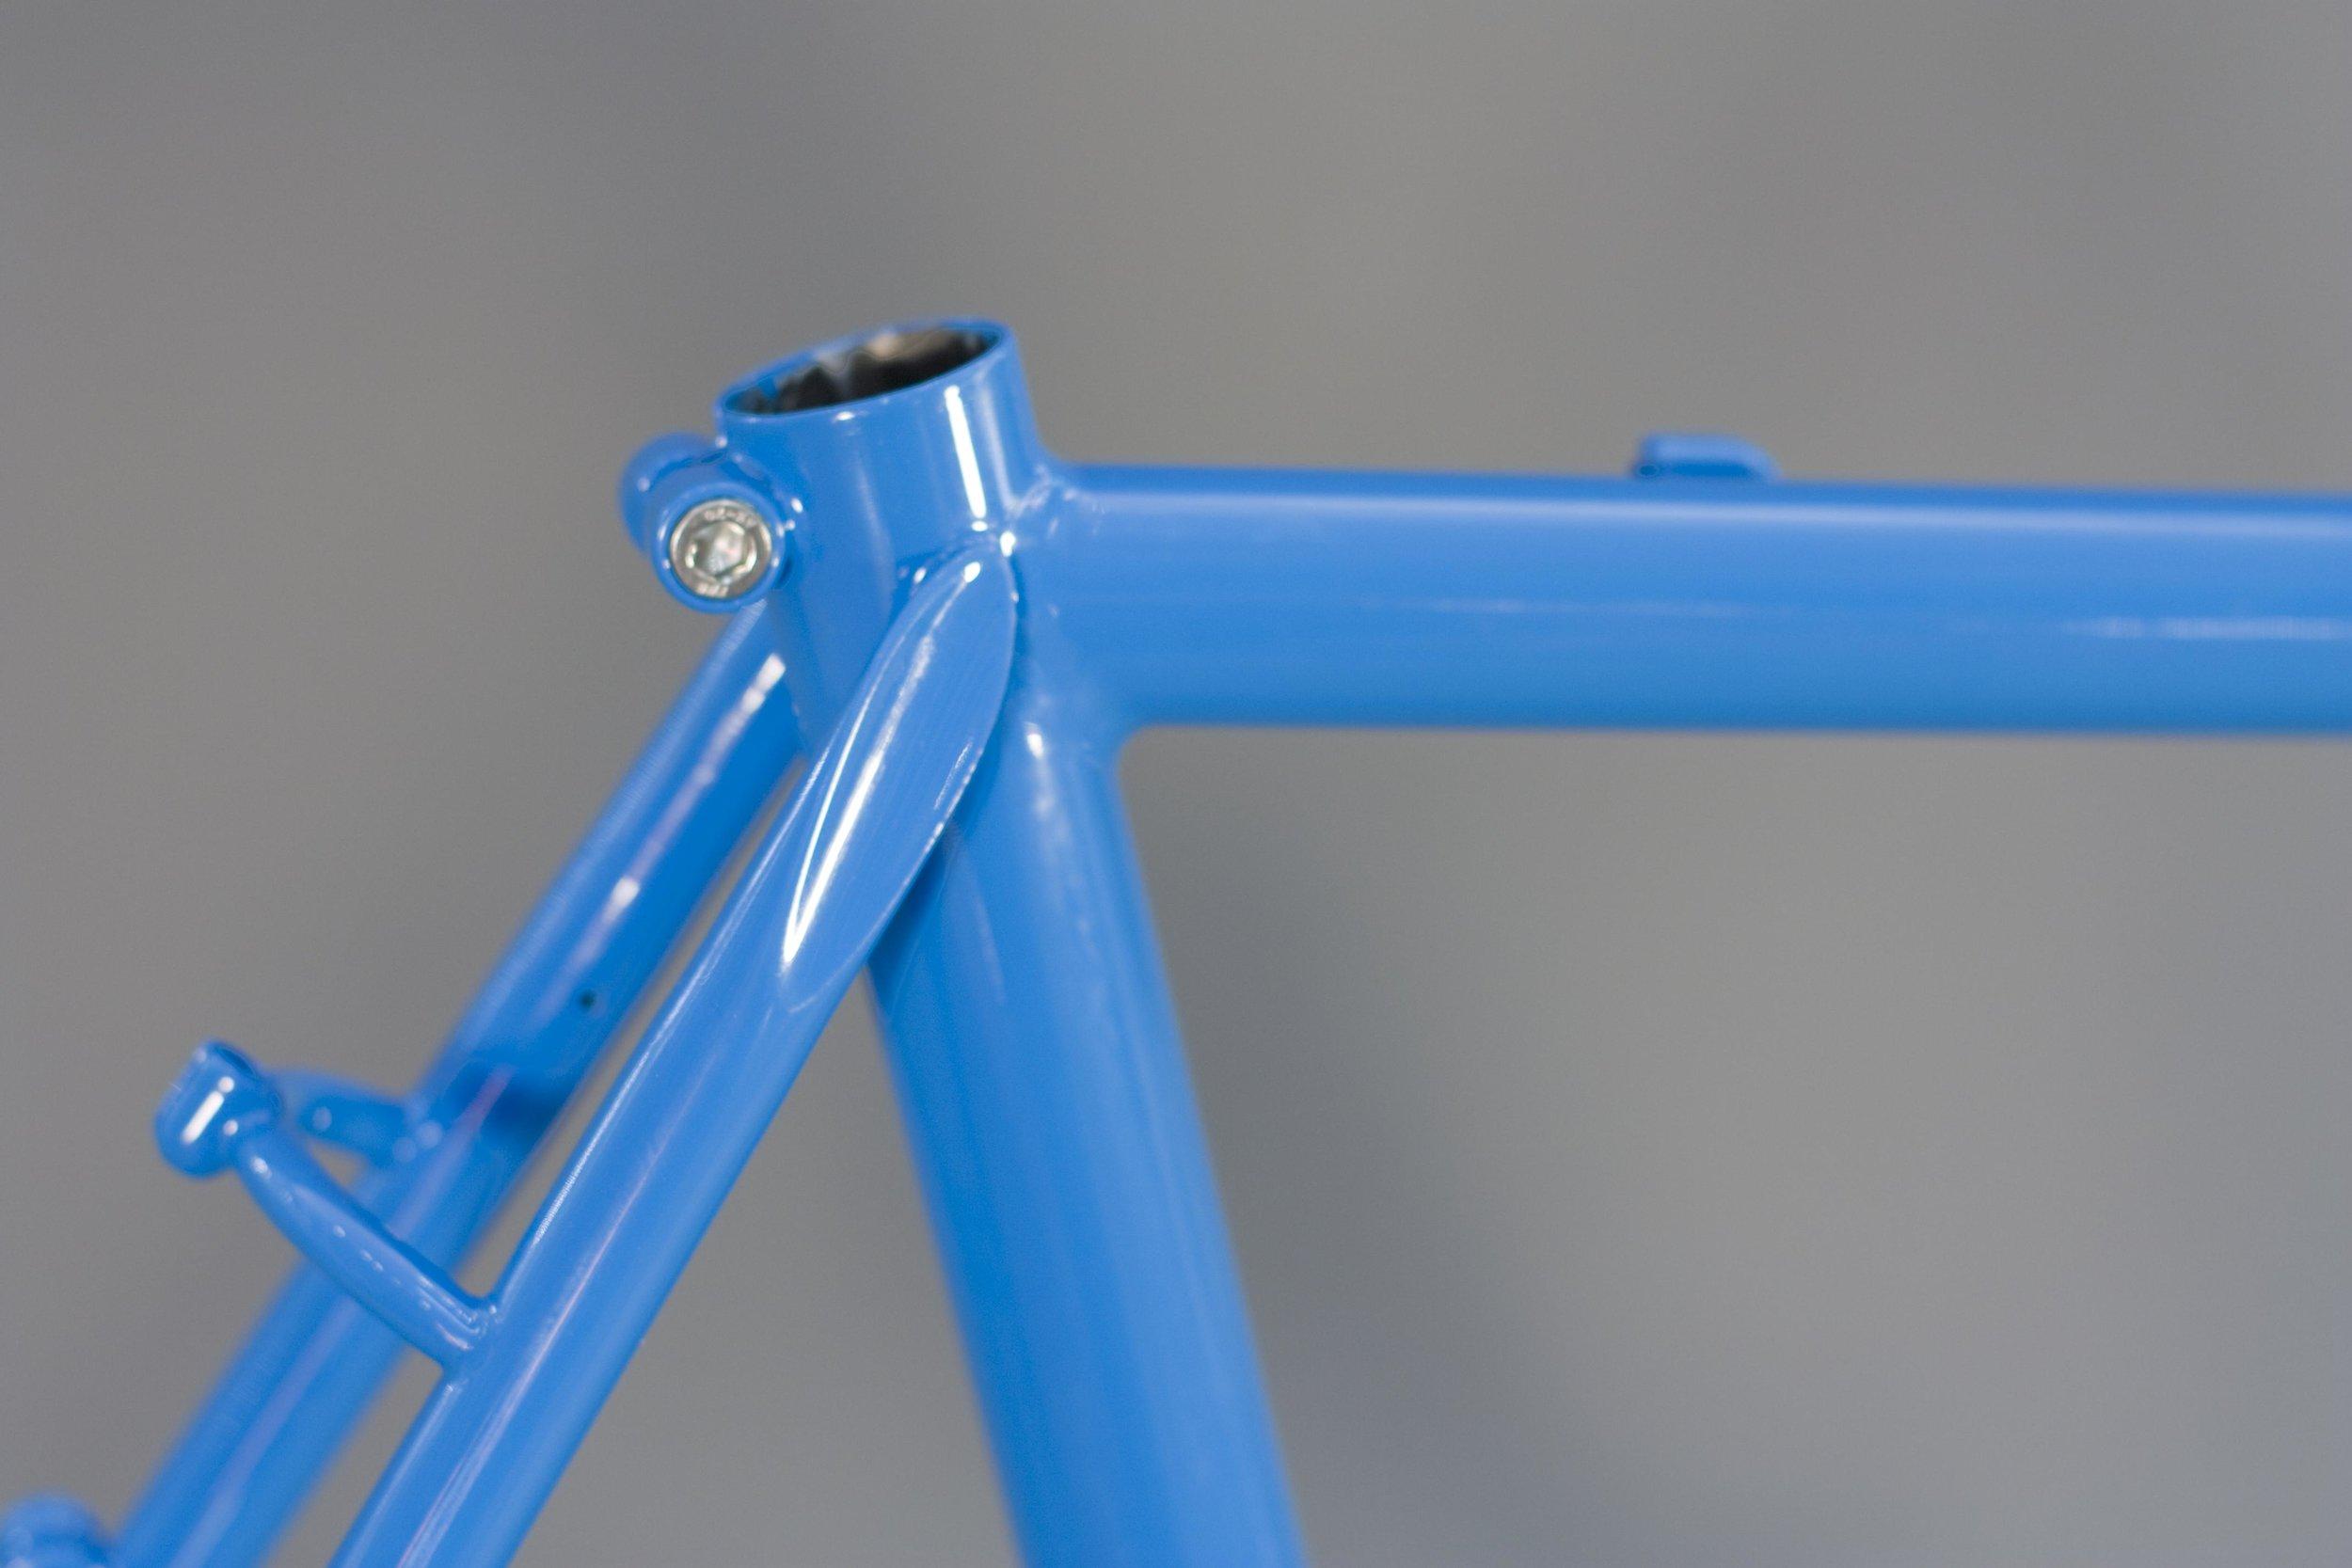 56cm-winter-bicycles-built-pelican_8270940306_o.jpg